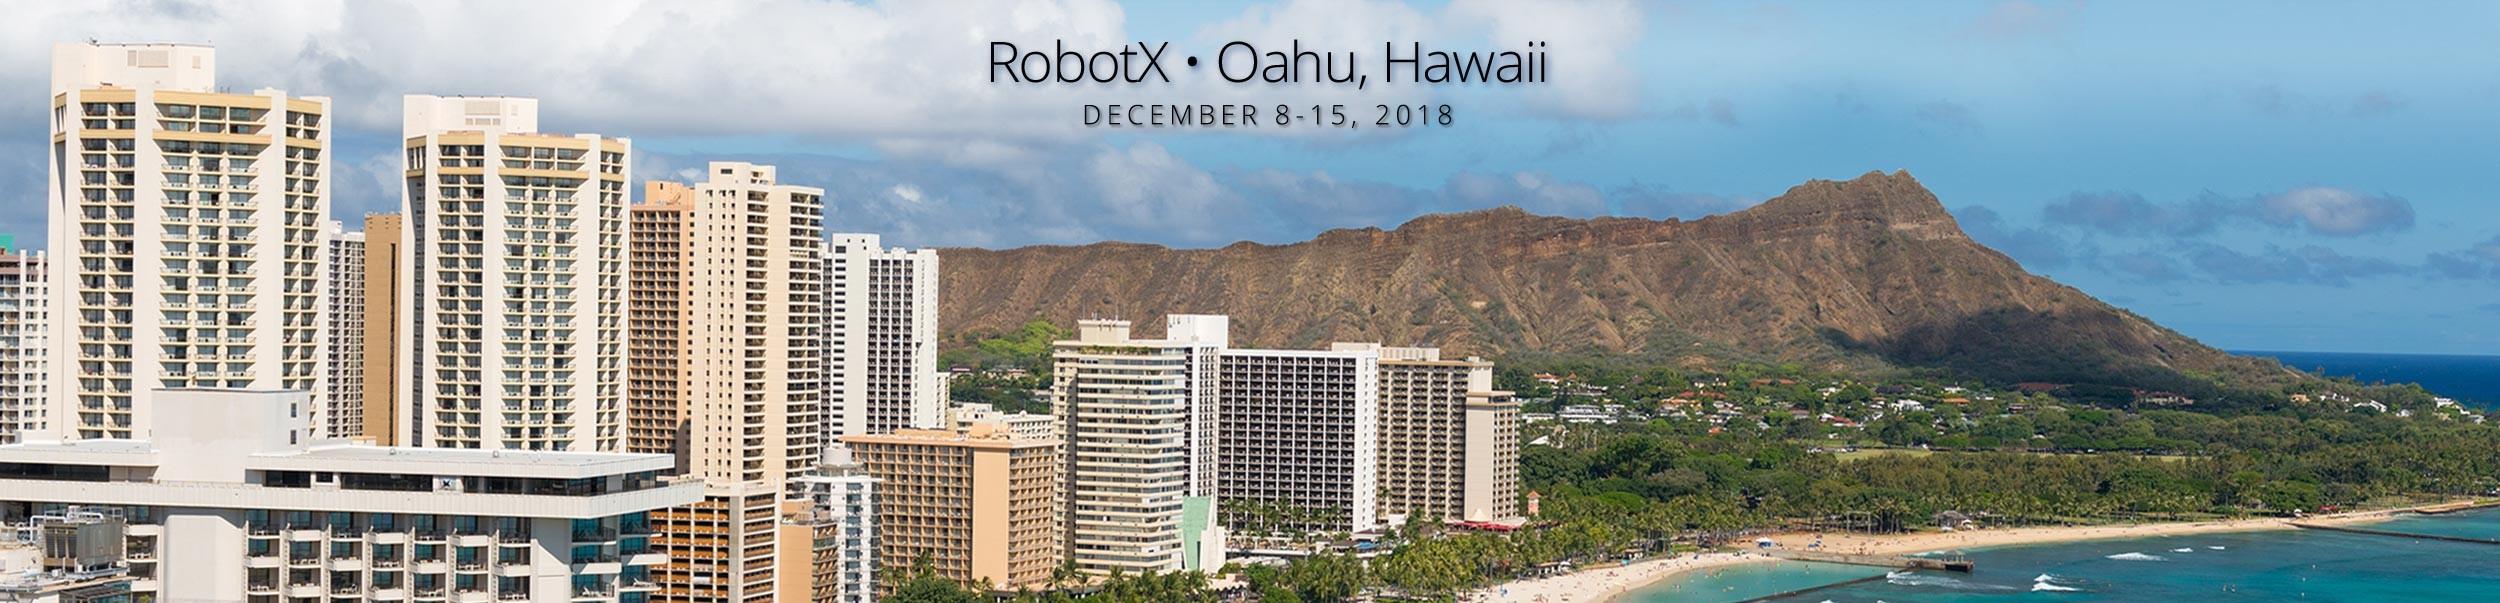 2018-dec-robotx-oahu-dates-17363b9f13.jpg